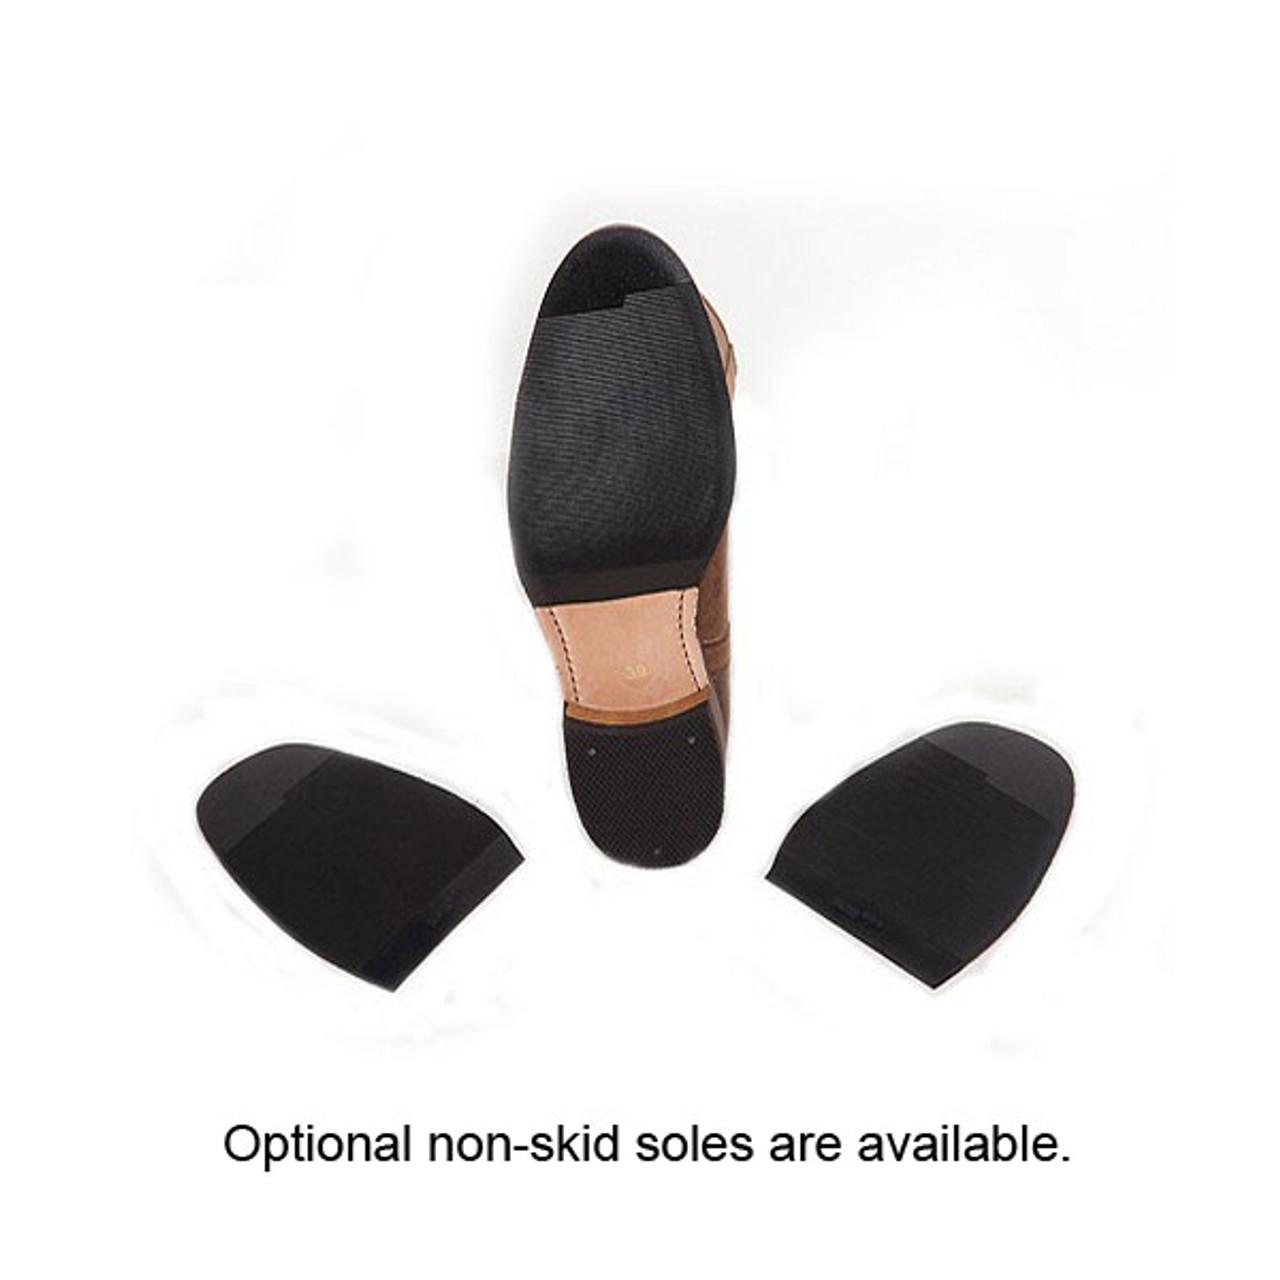 Optional Skid-proof Soles